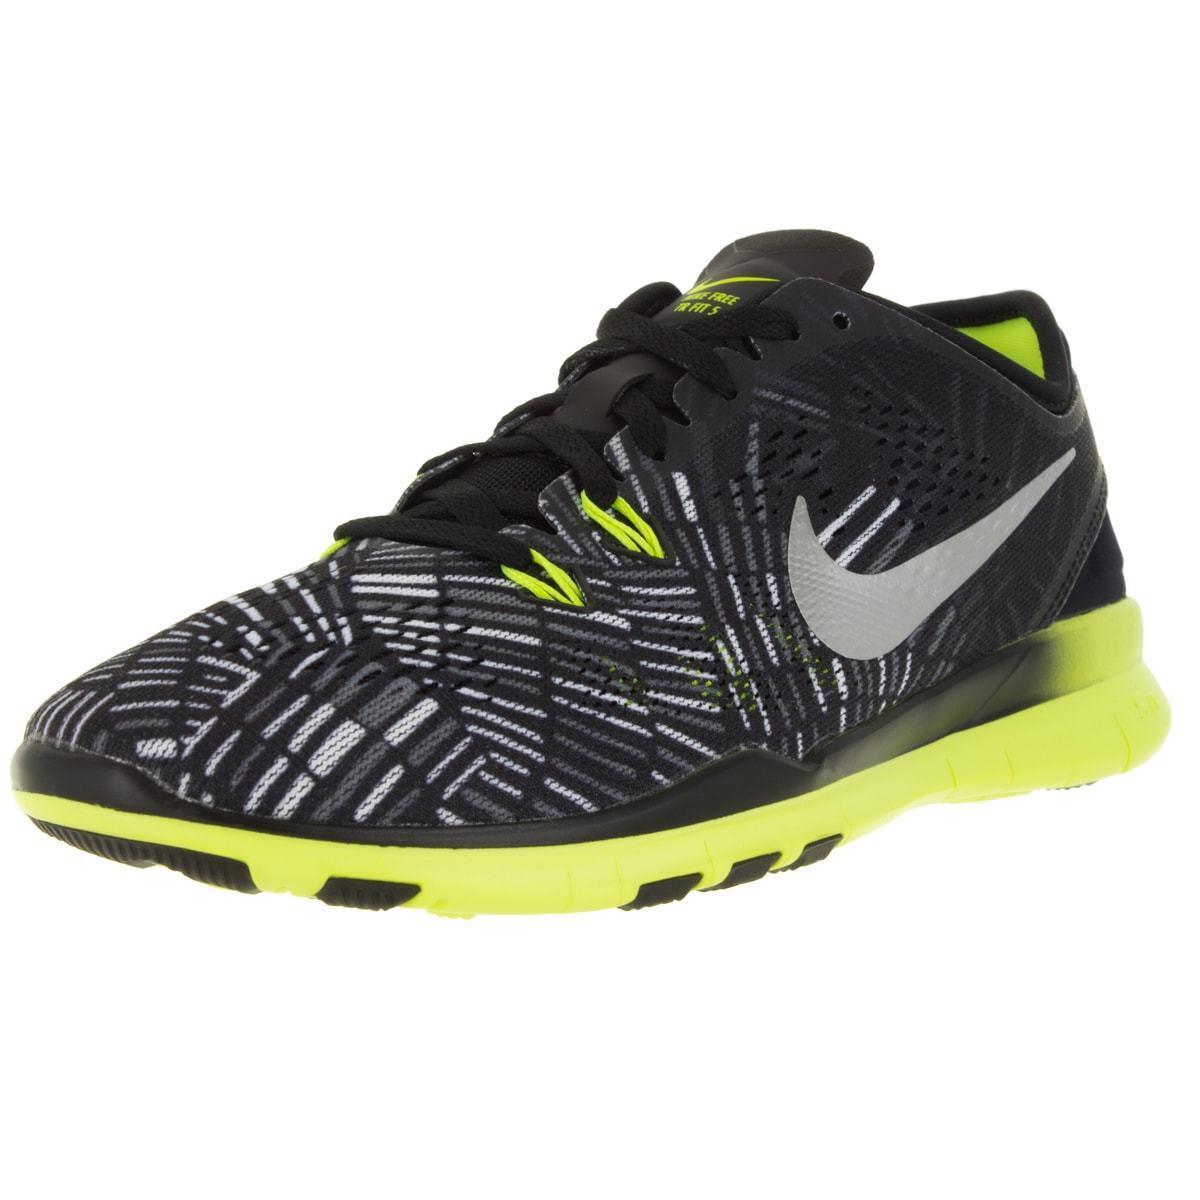 Nike Women's Free 5.0 Tr Fit 5 Prt Prt Prt Black Metallic Silver Volt Training sz 8 ee8c43